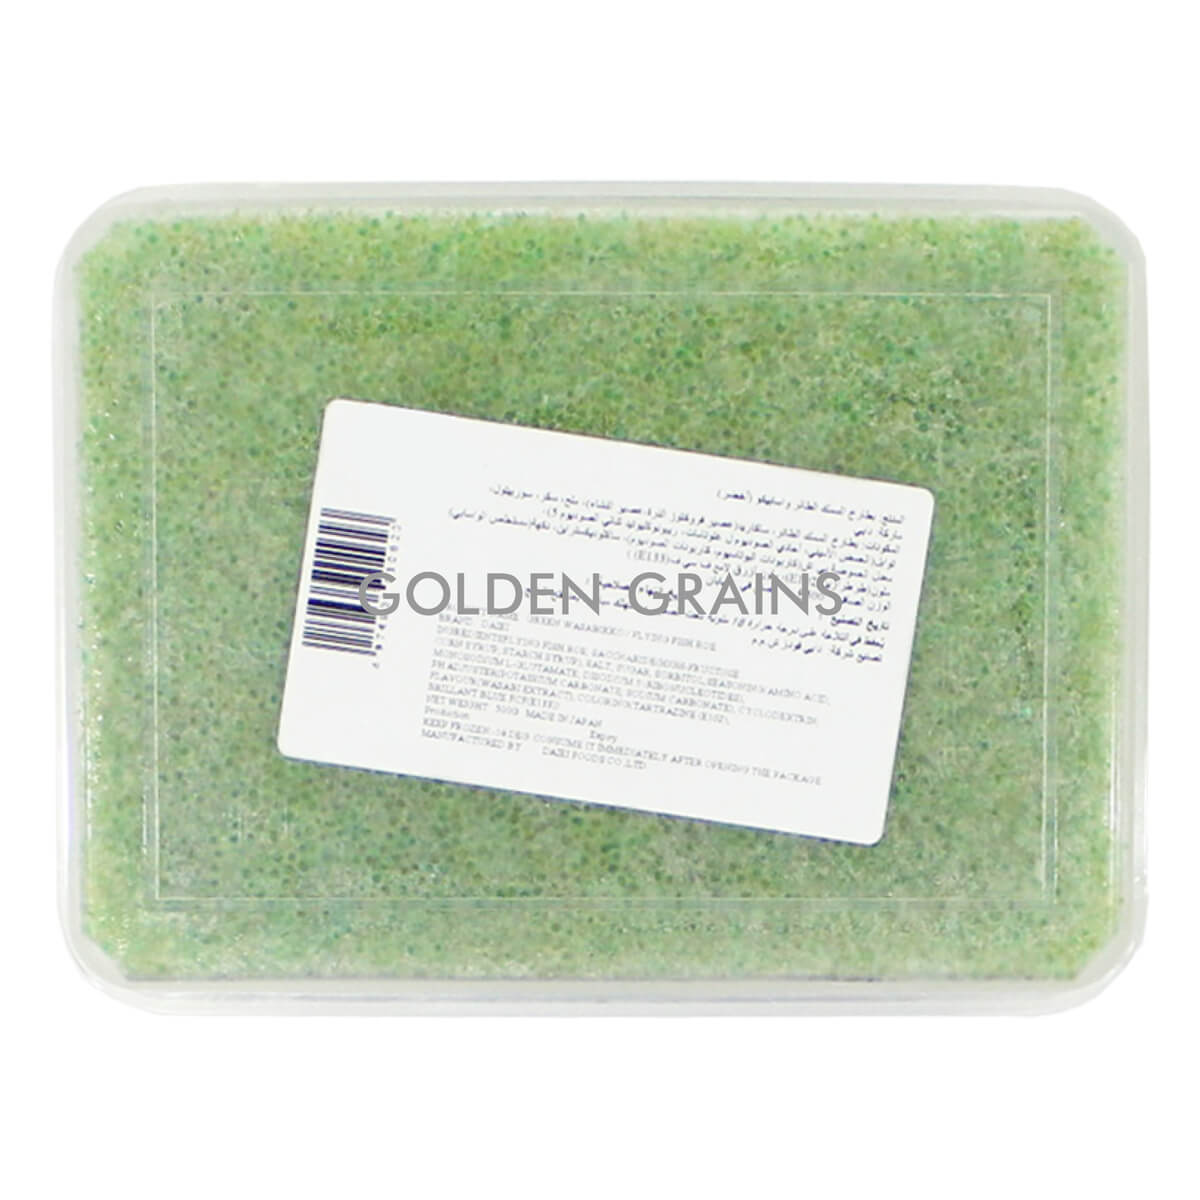 Golden Grains Daiei - Green Tobiko - Back.jpg